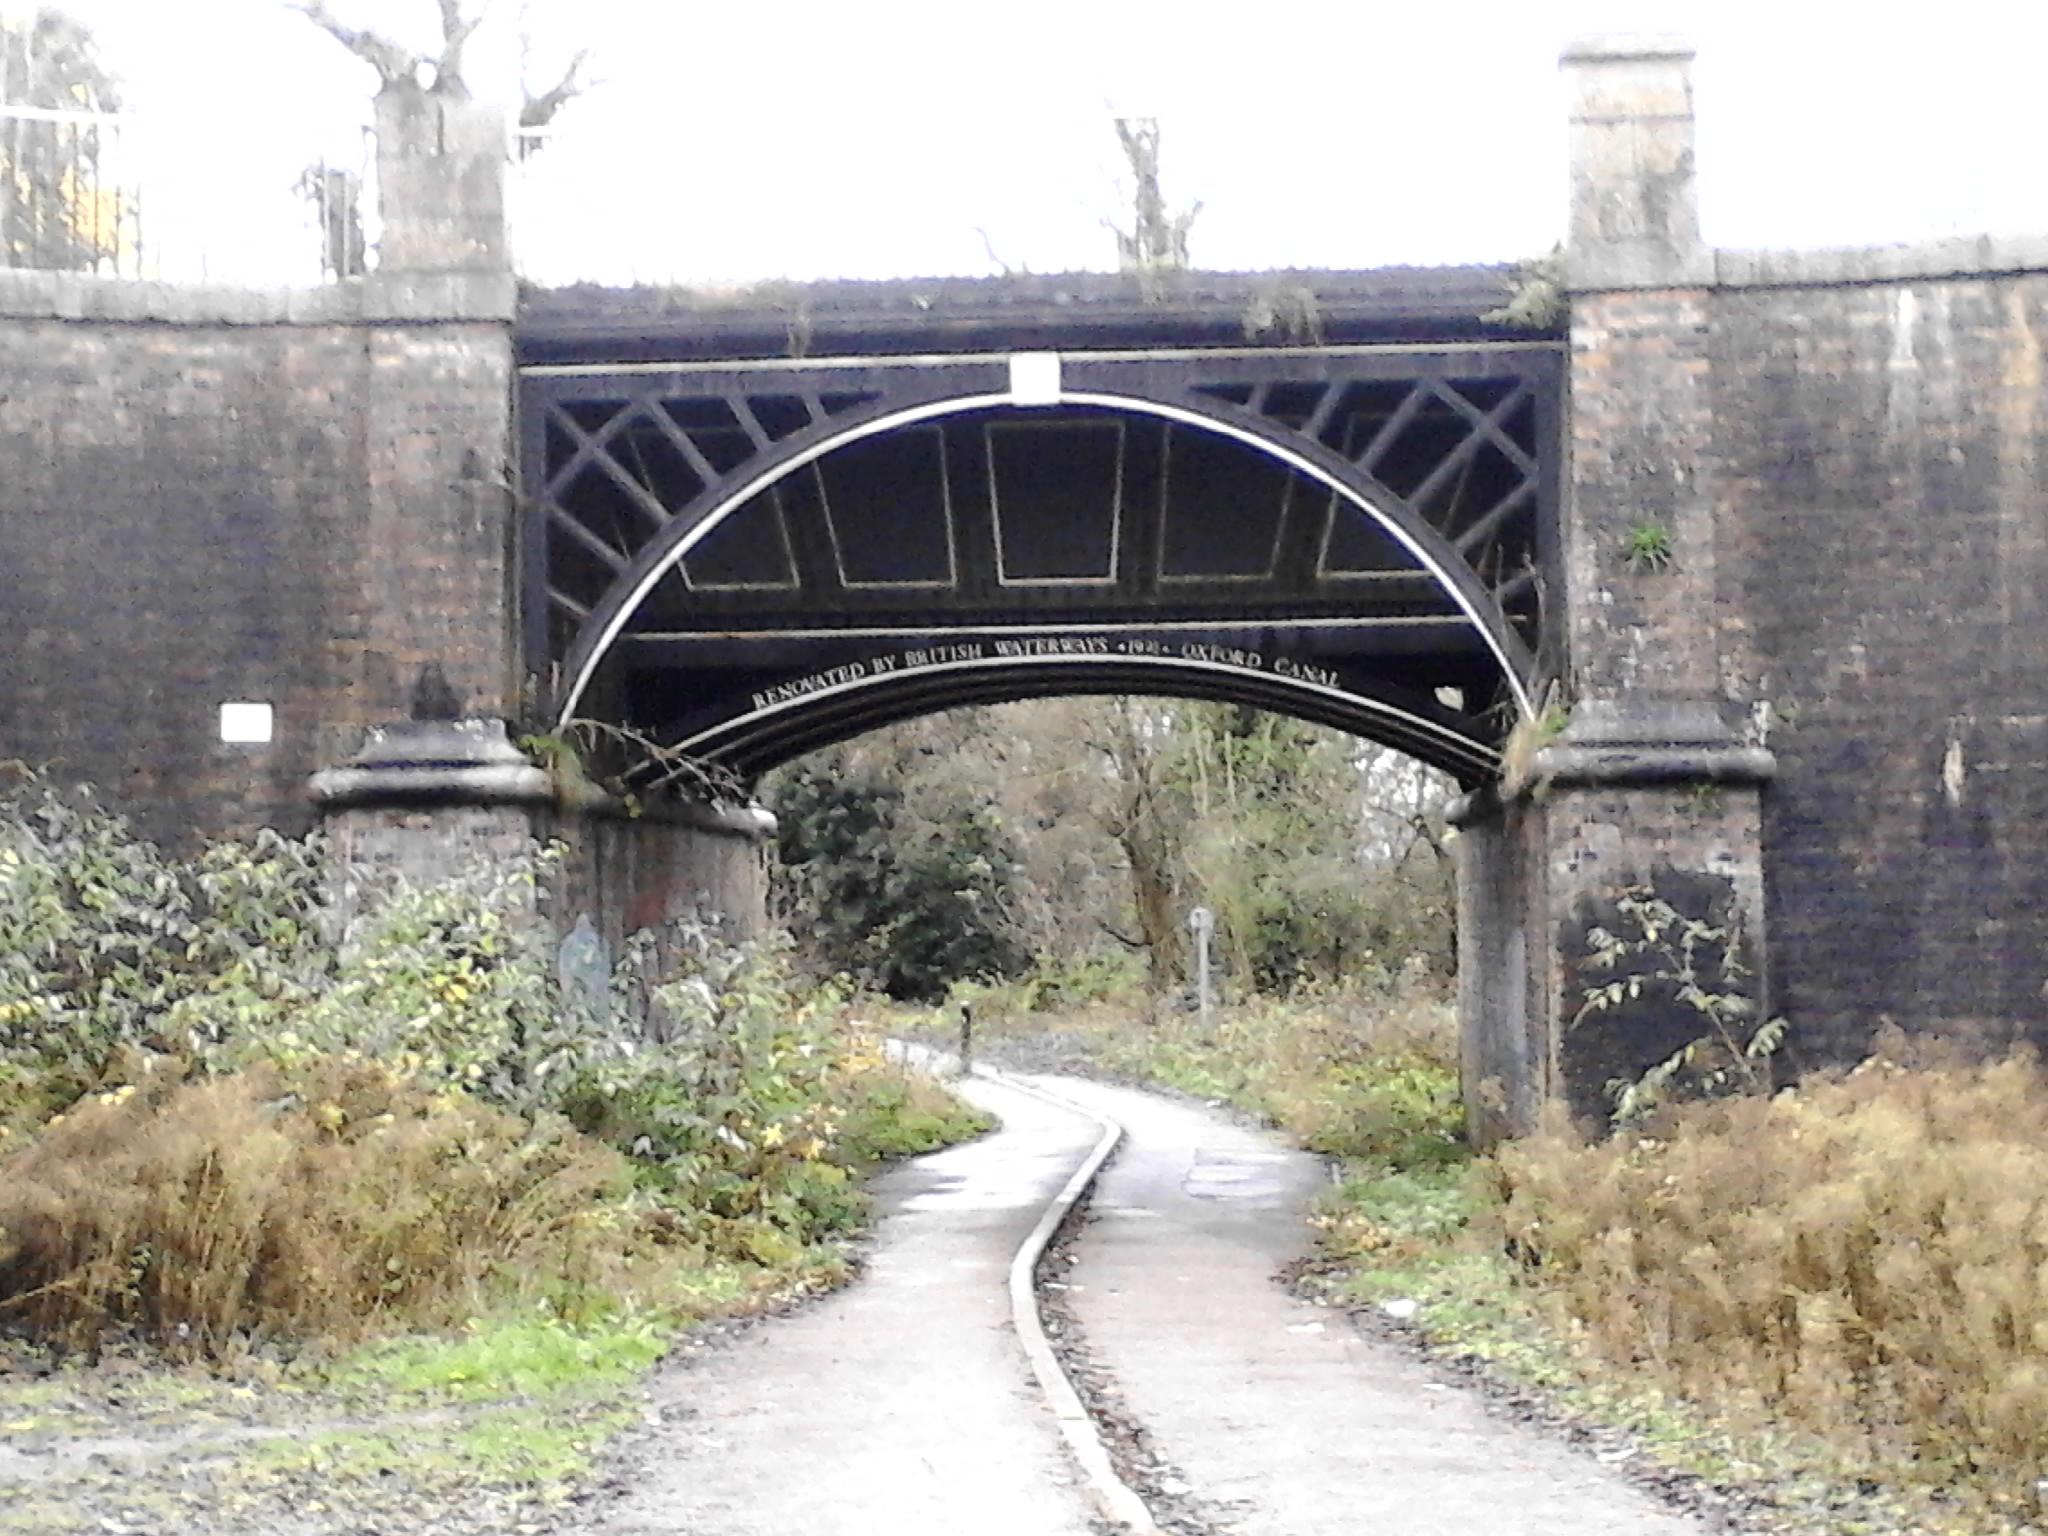 Oxford Canal Aqueduct